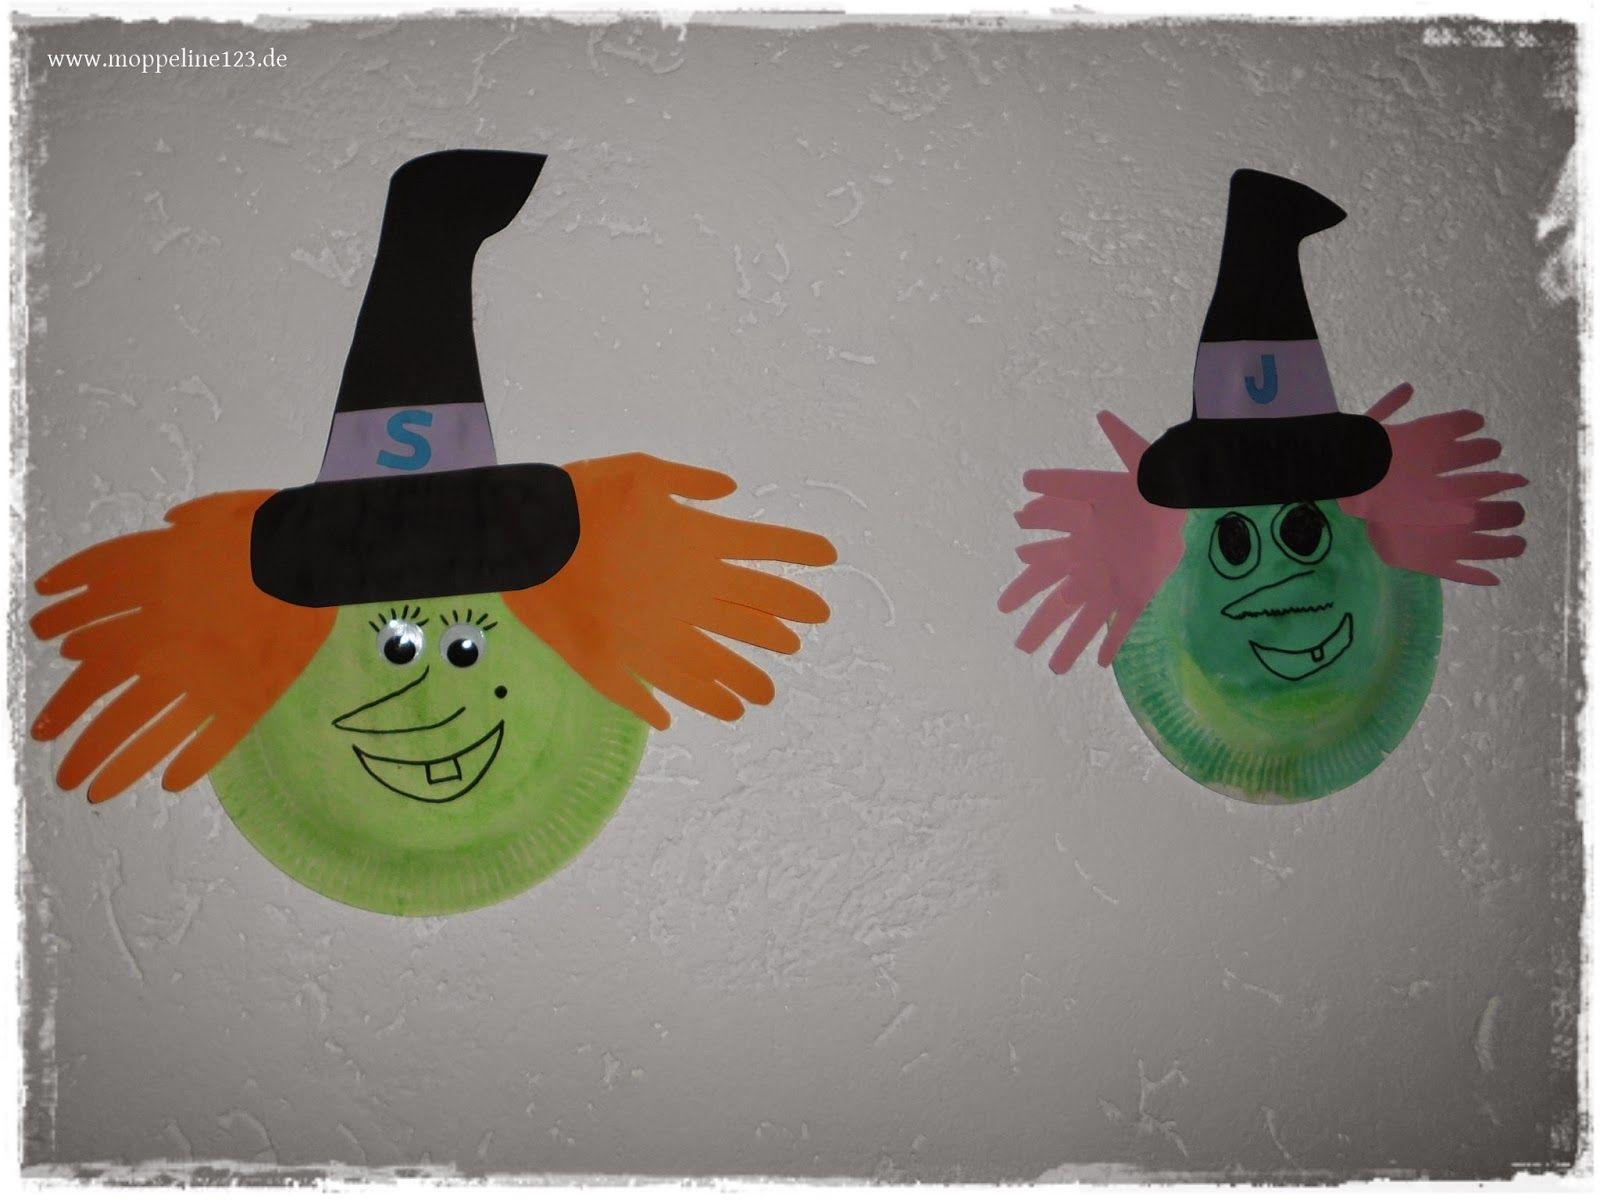 moppeline123 halloween bastelei pappteller geister und hexen halloween halloween diy. Black Bedroom Furniture Sets. Home Design Ideas